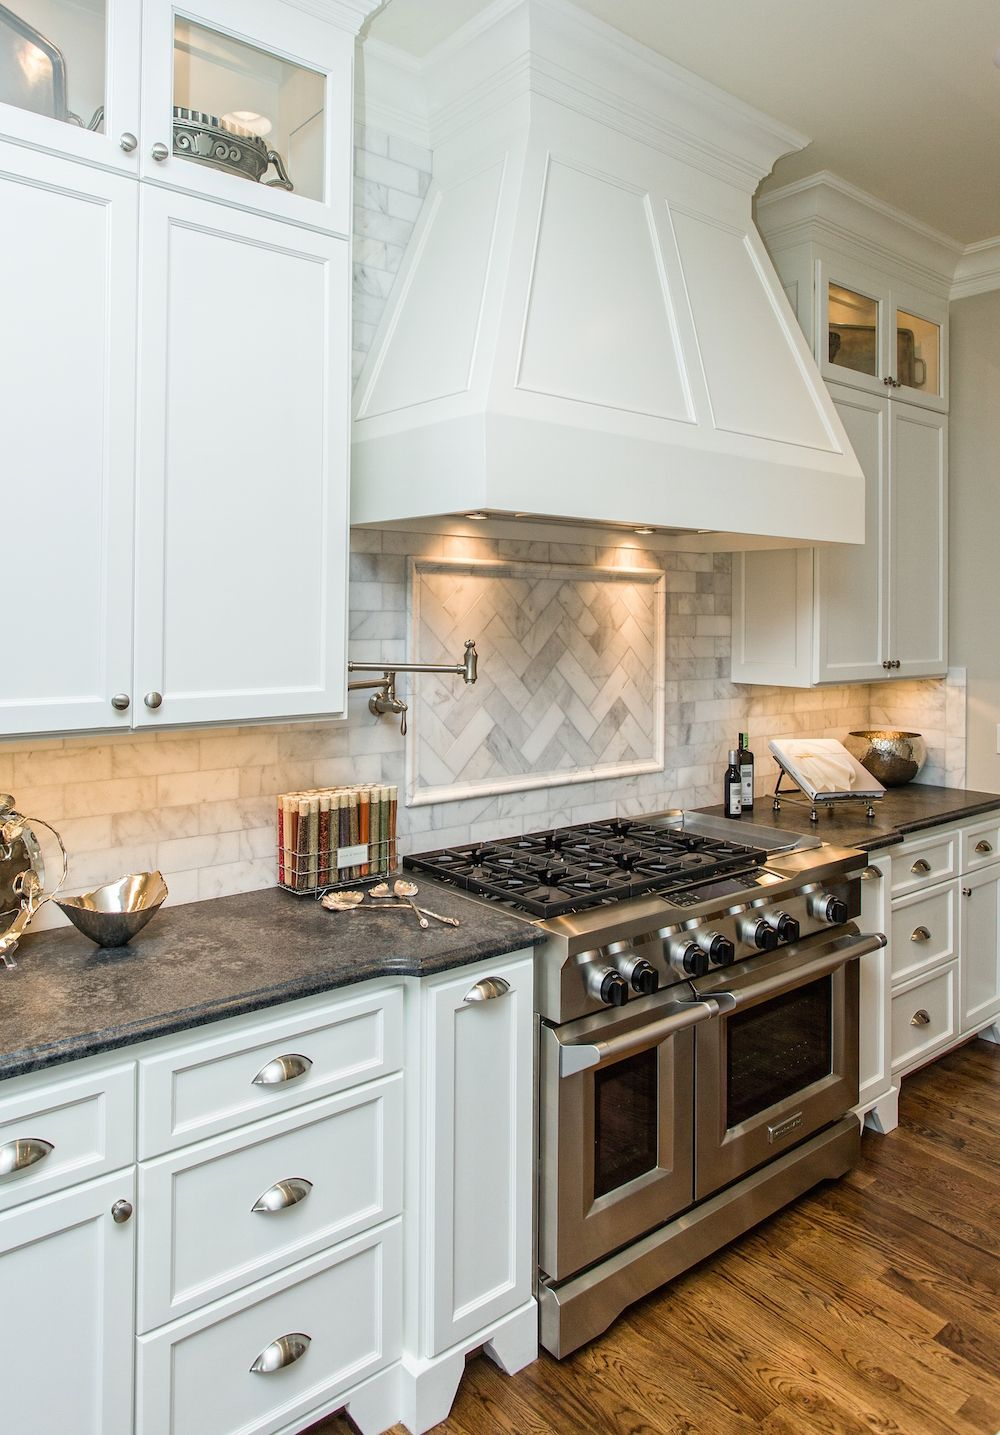 Beautiful White Kitchen Designs Alluring A Beautiful White Kitchen With Marble Backsplash And Gas Range In Design Inspiration